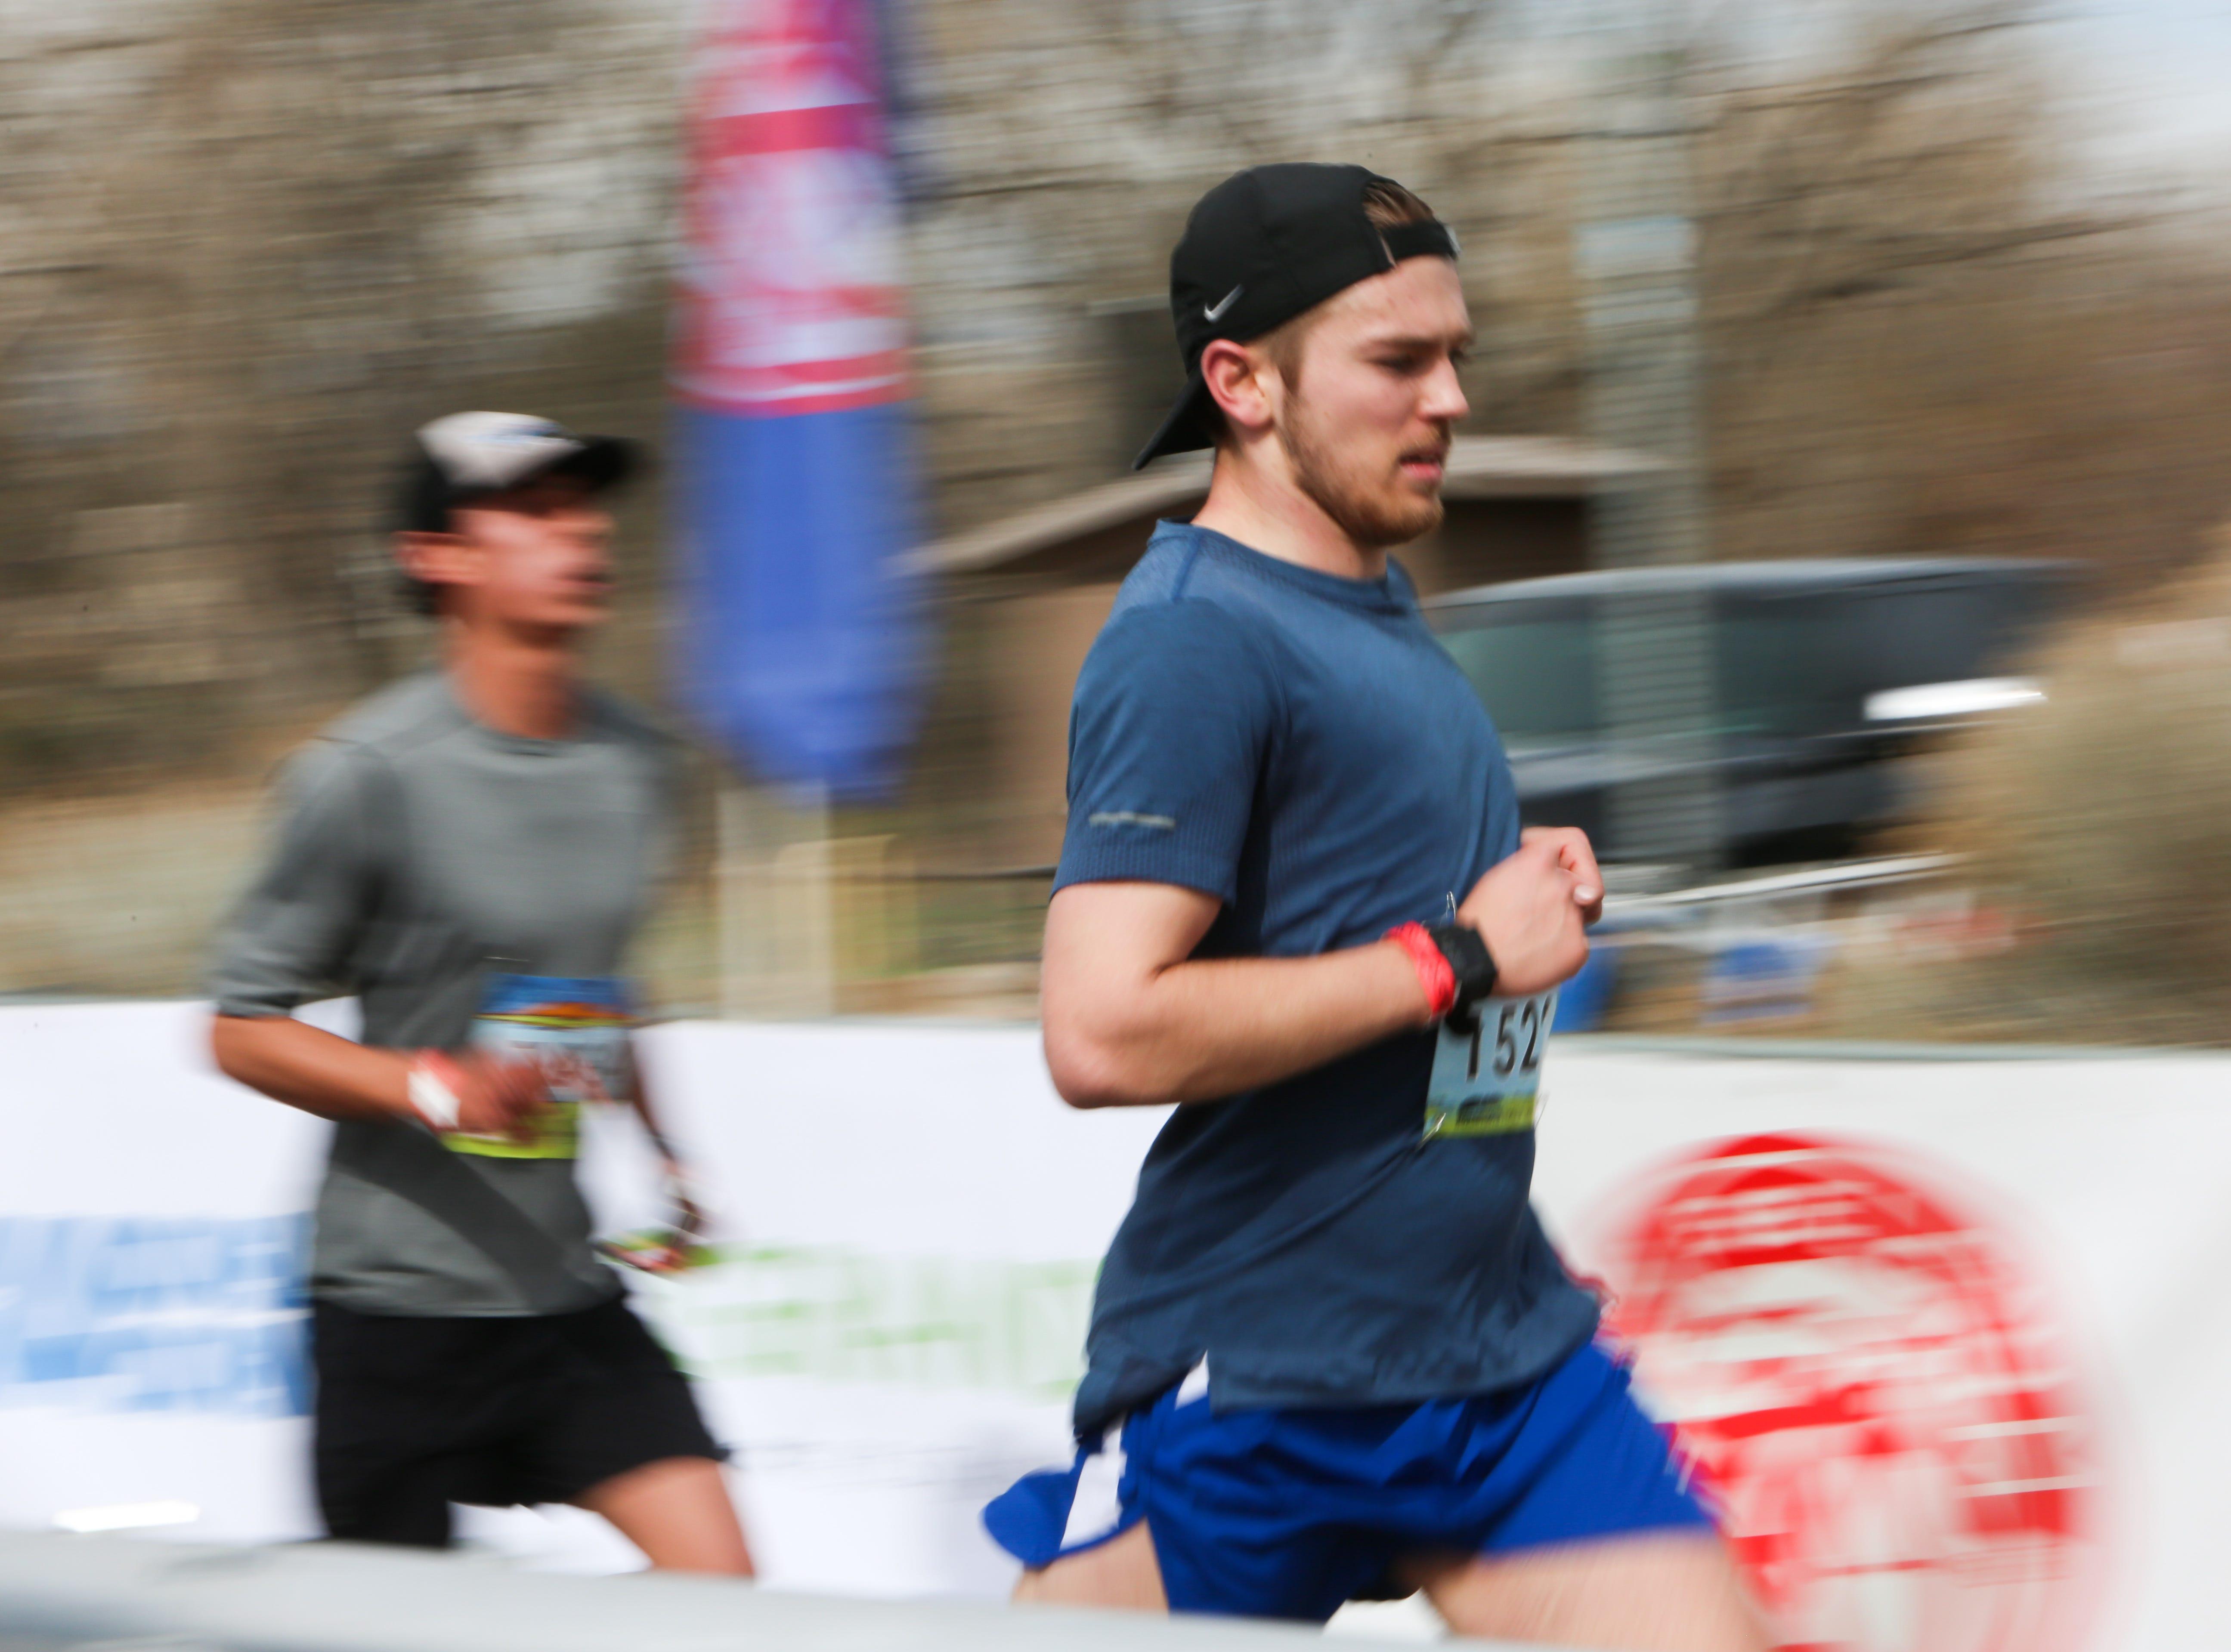 Runners finish the Half Marathon at New Belgium on April 14.